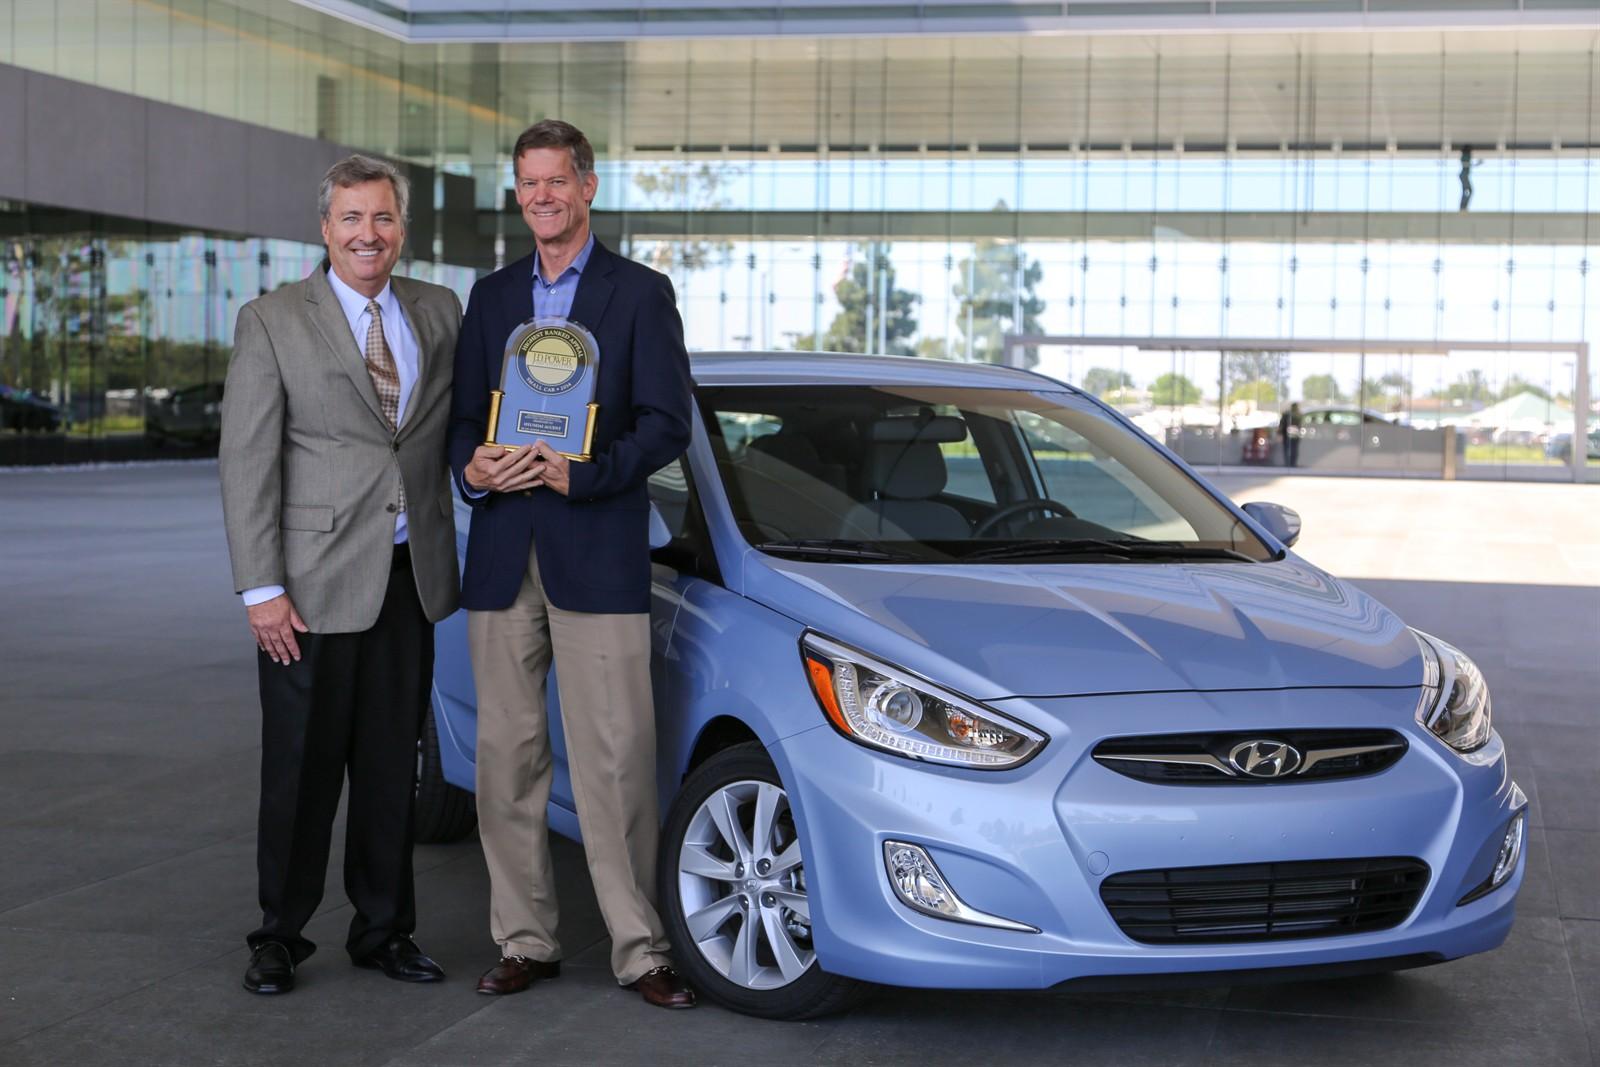 Hyundai Ranked Highest Non-Premium In J. D. Power Apeal Study